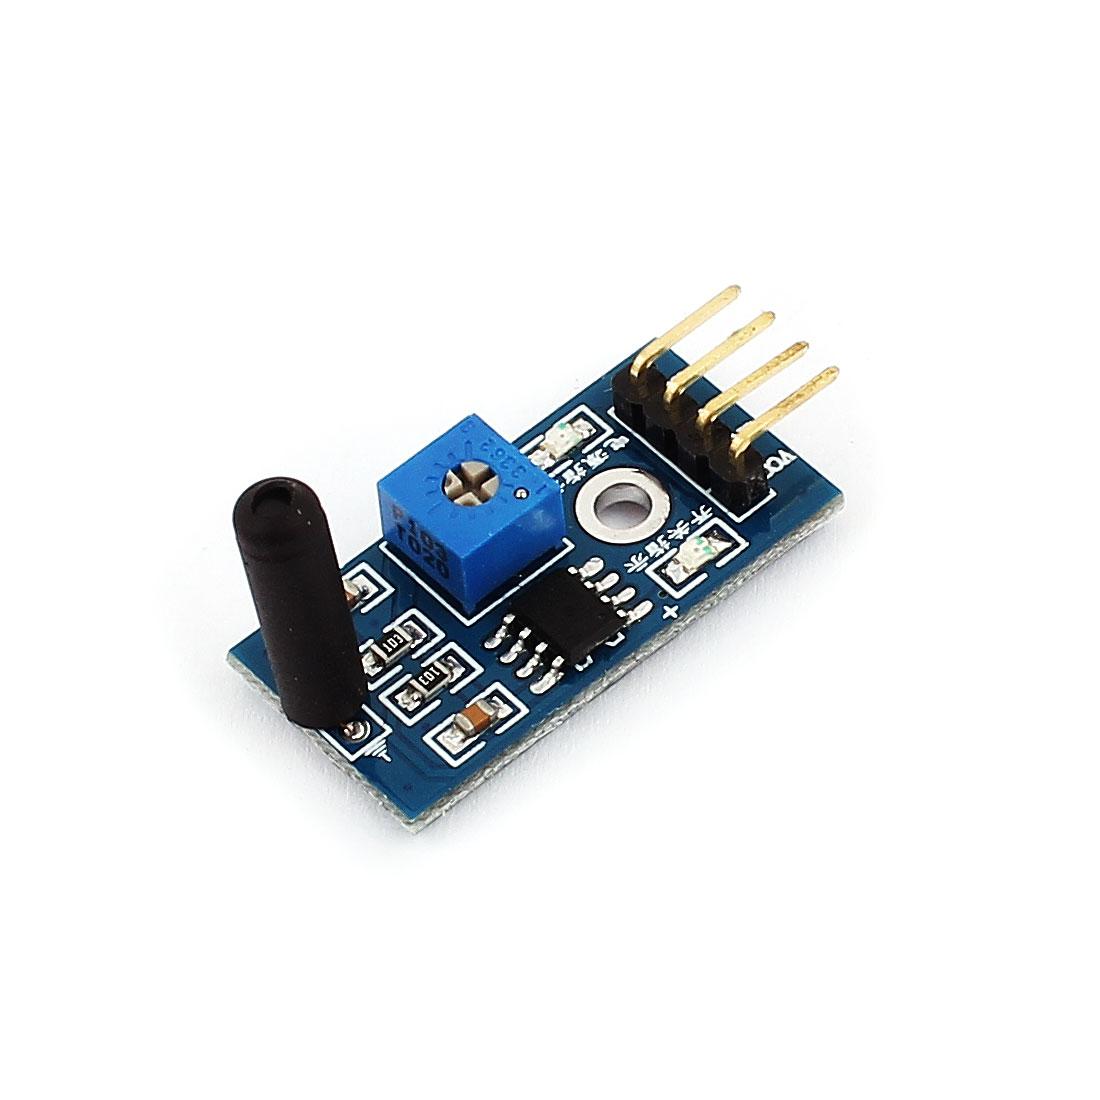 Indicator Light Single Channel Shock Sensor Module for Smart Car